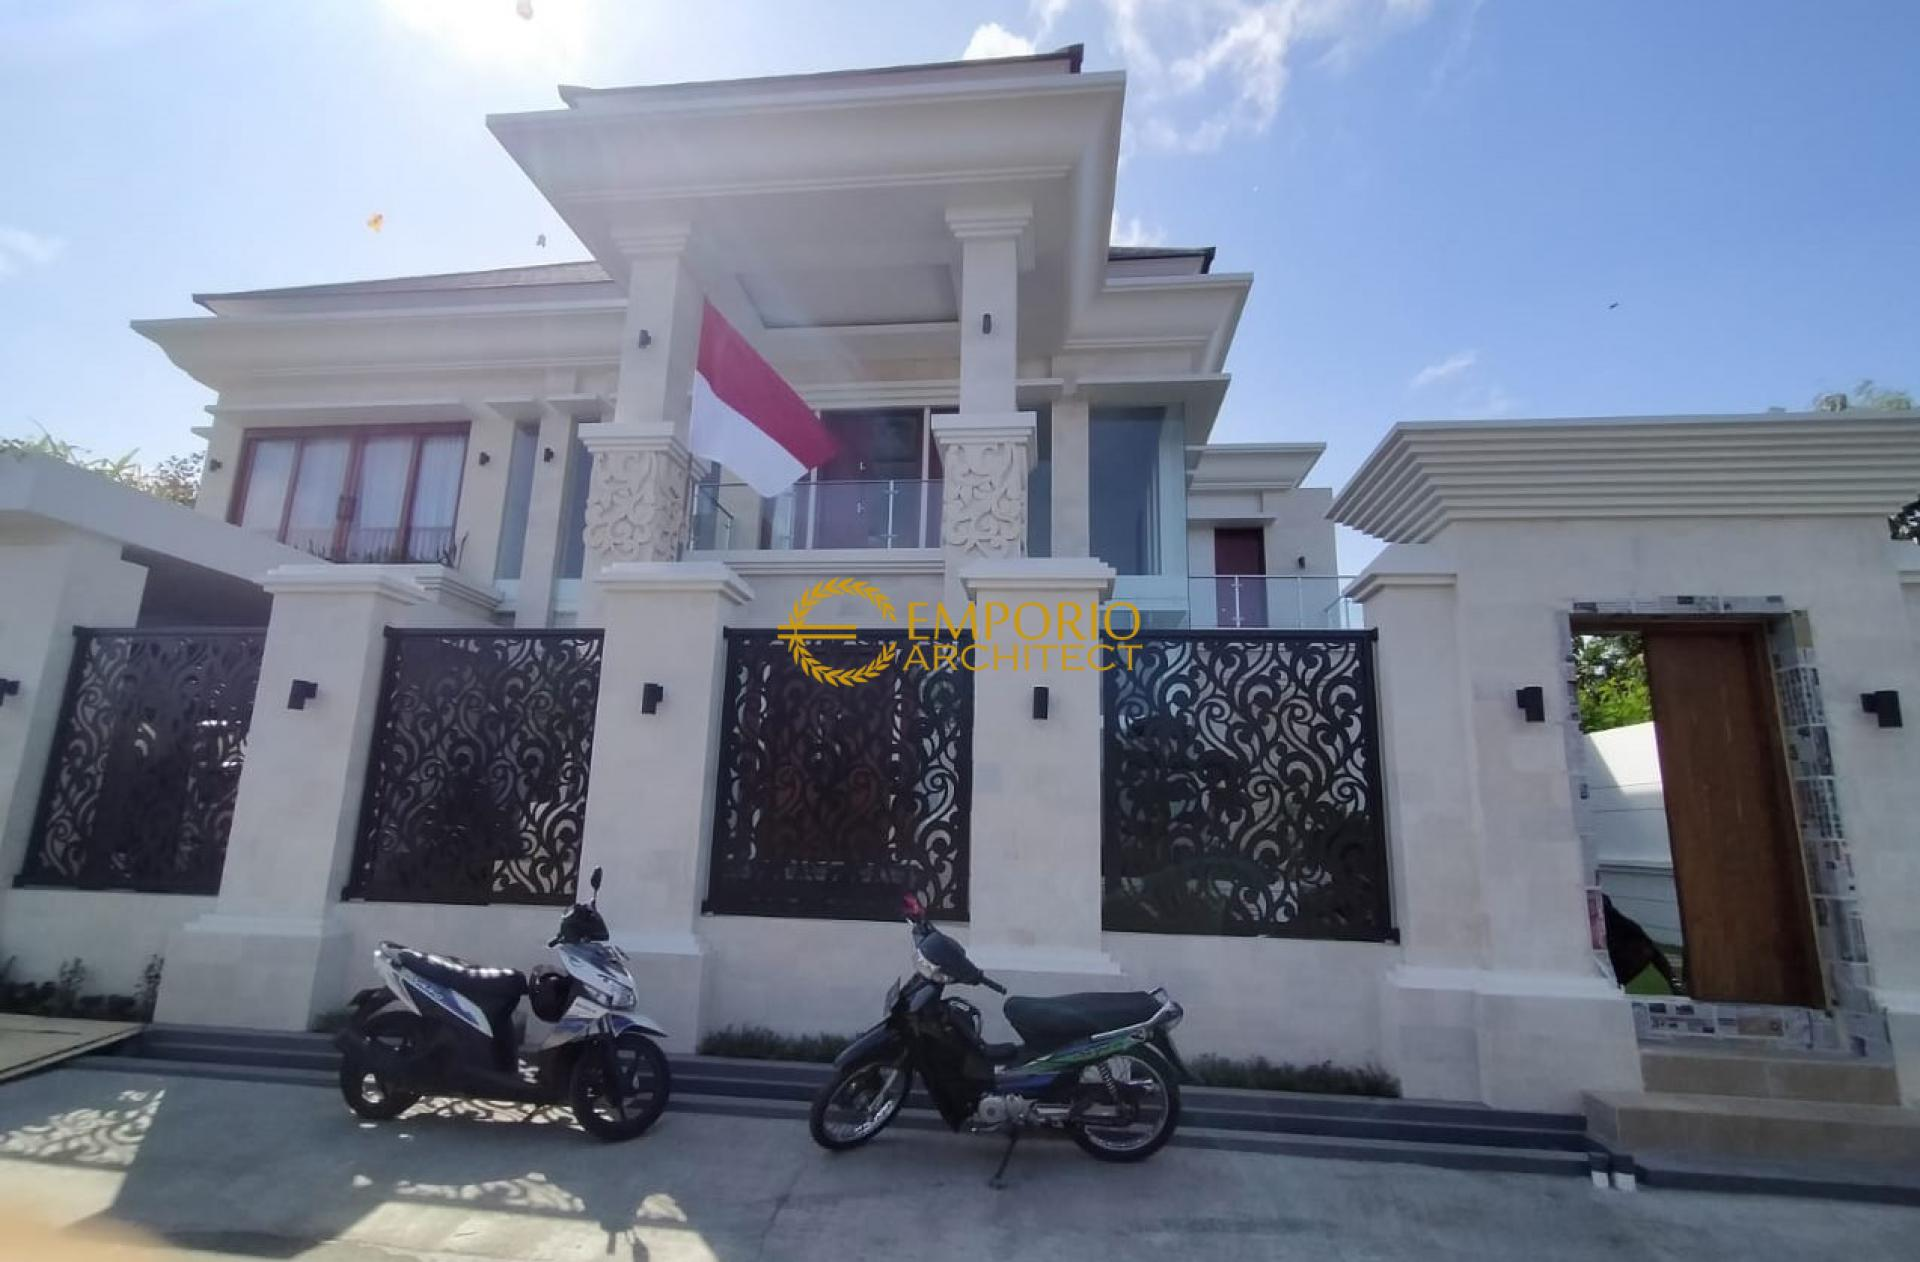 Construction Progress of Mrs. Mirah Private House Design - Denpasar, Bali